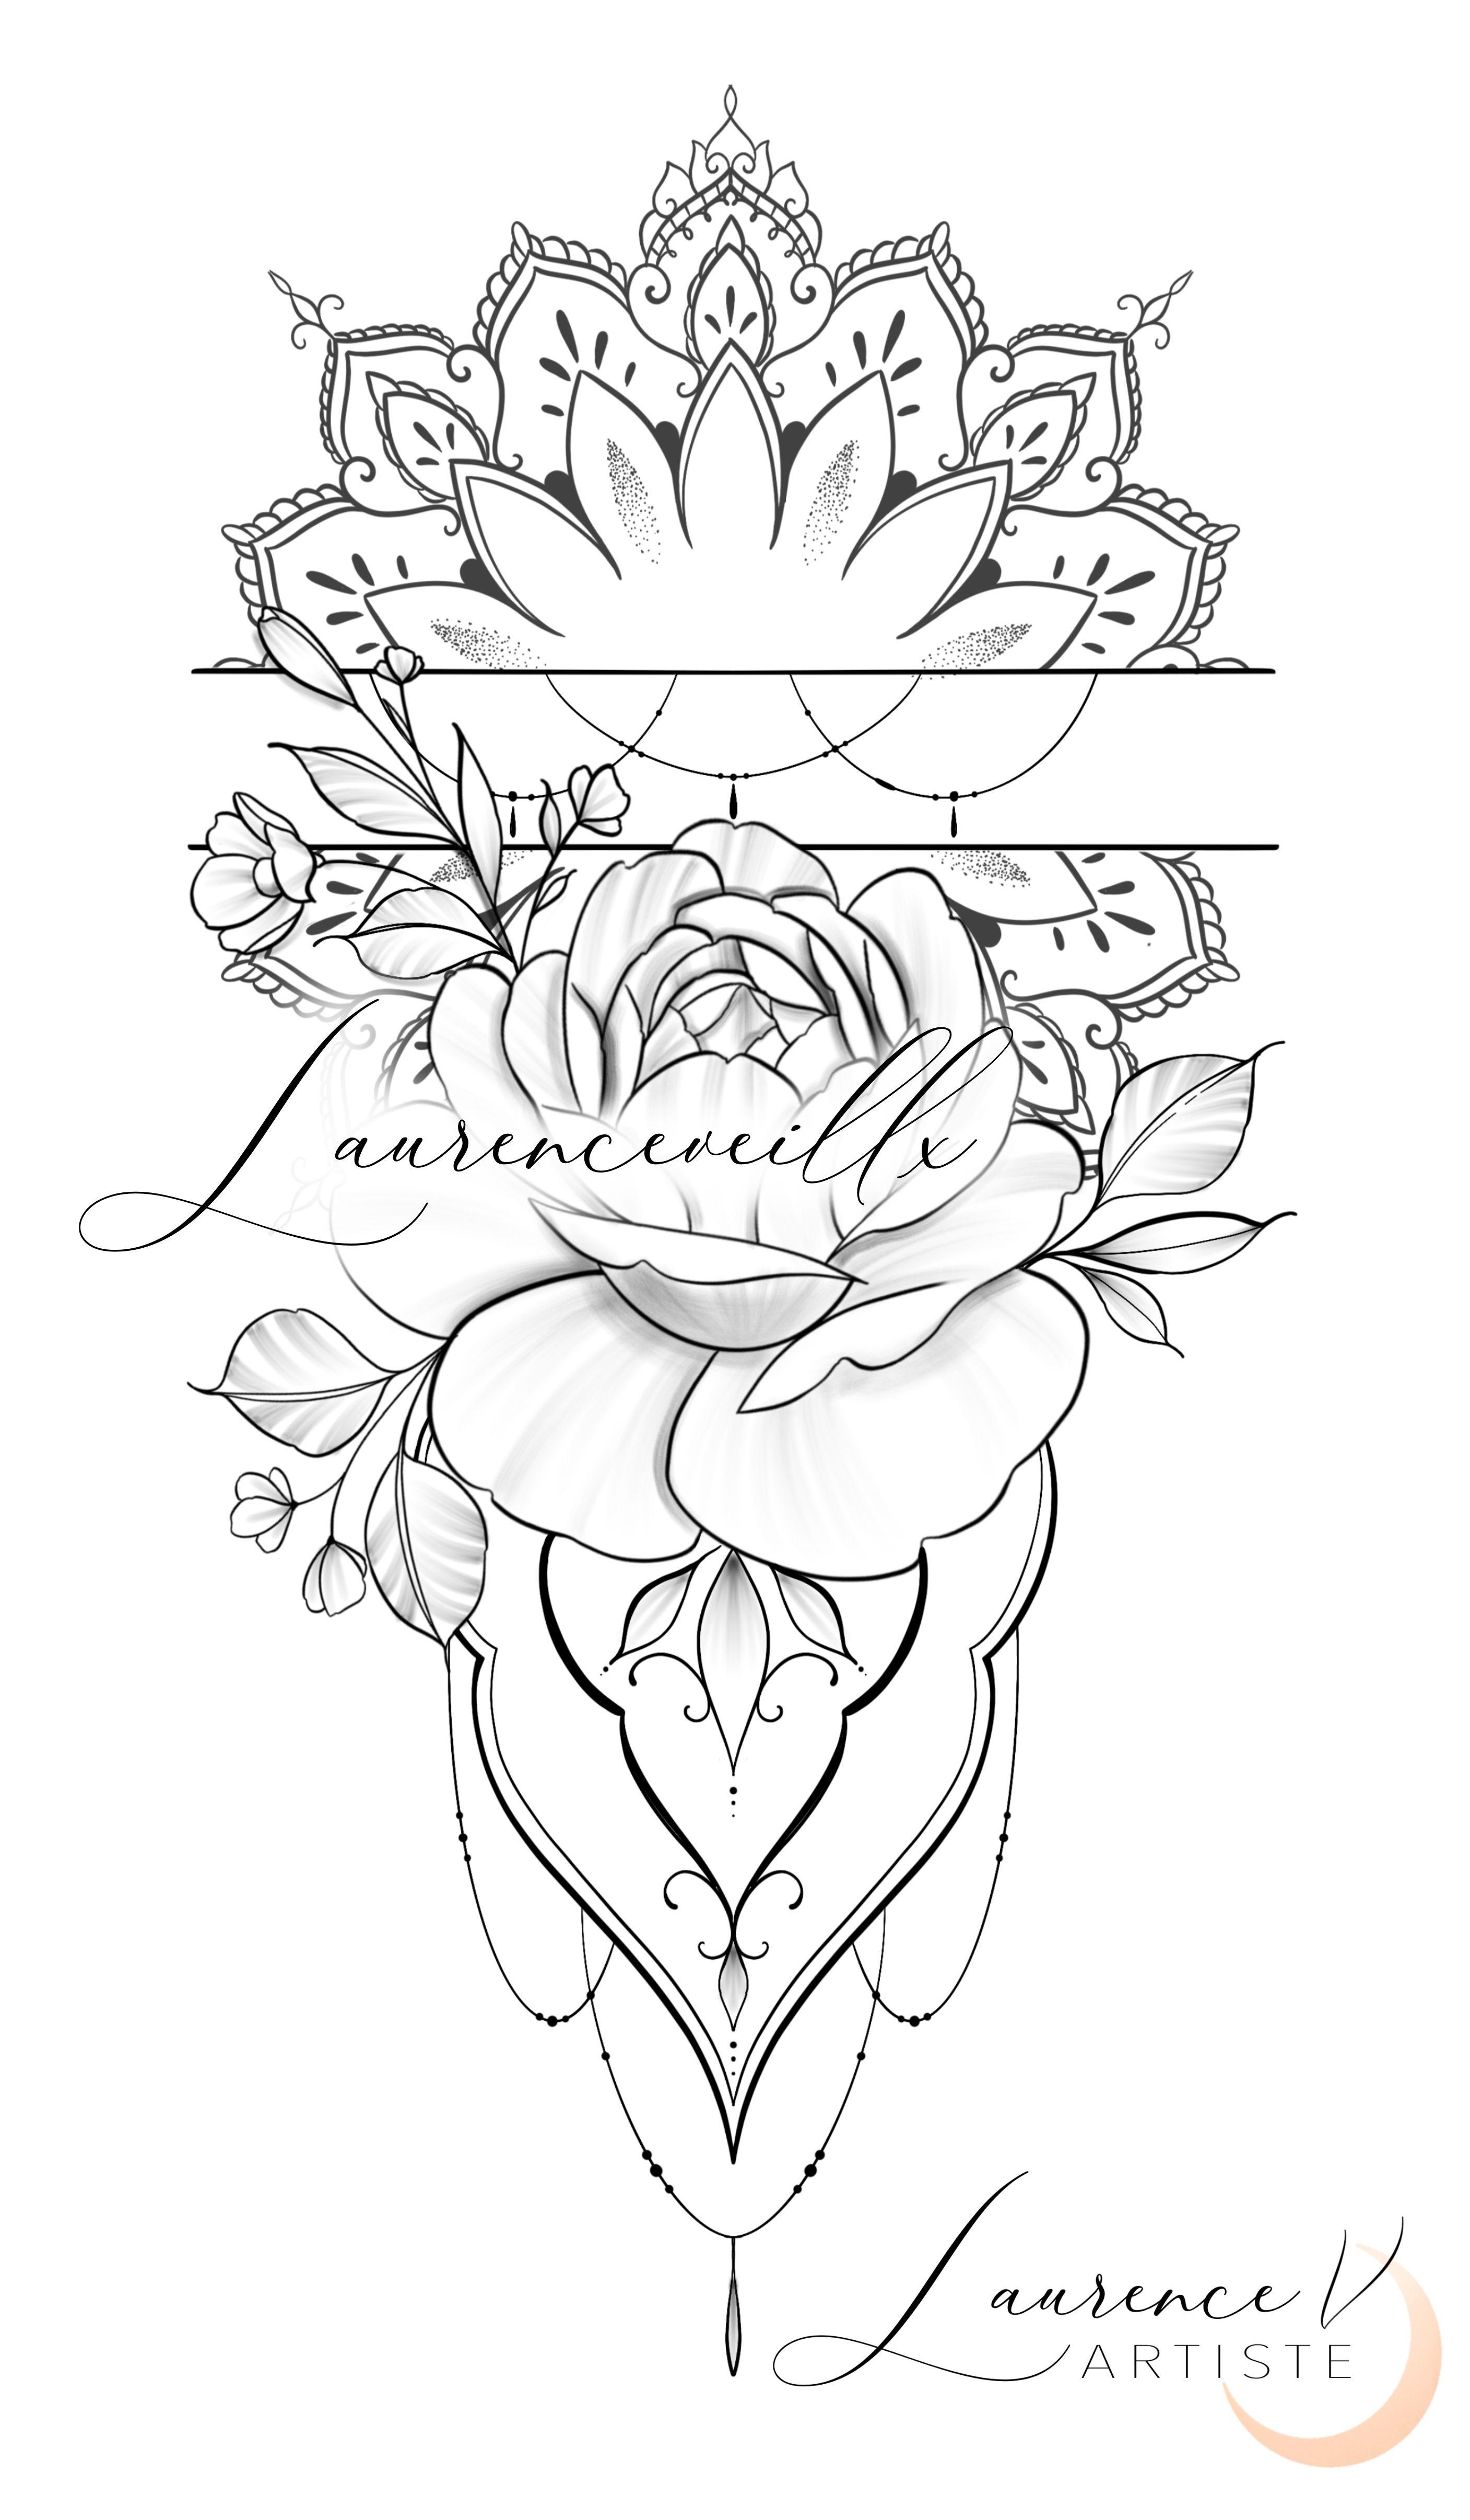 Mandala Roses Ornemental Tattoo Design Instant Download In 2020 Mandala Tattoo Design Tattoo Stencil Outline Feminine Tattoos